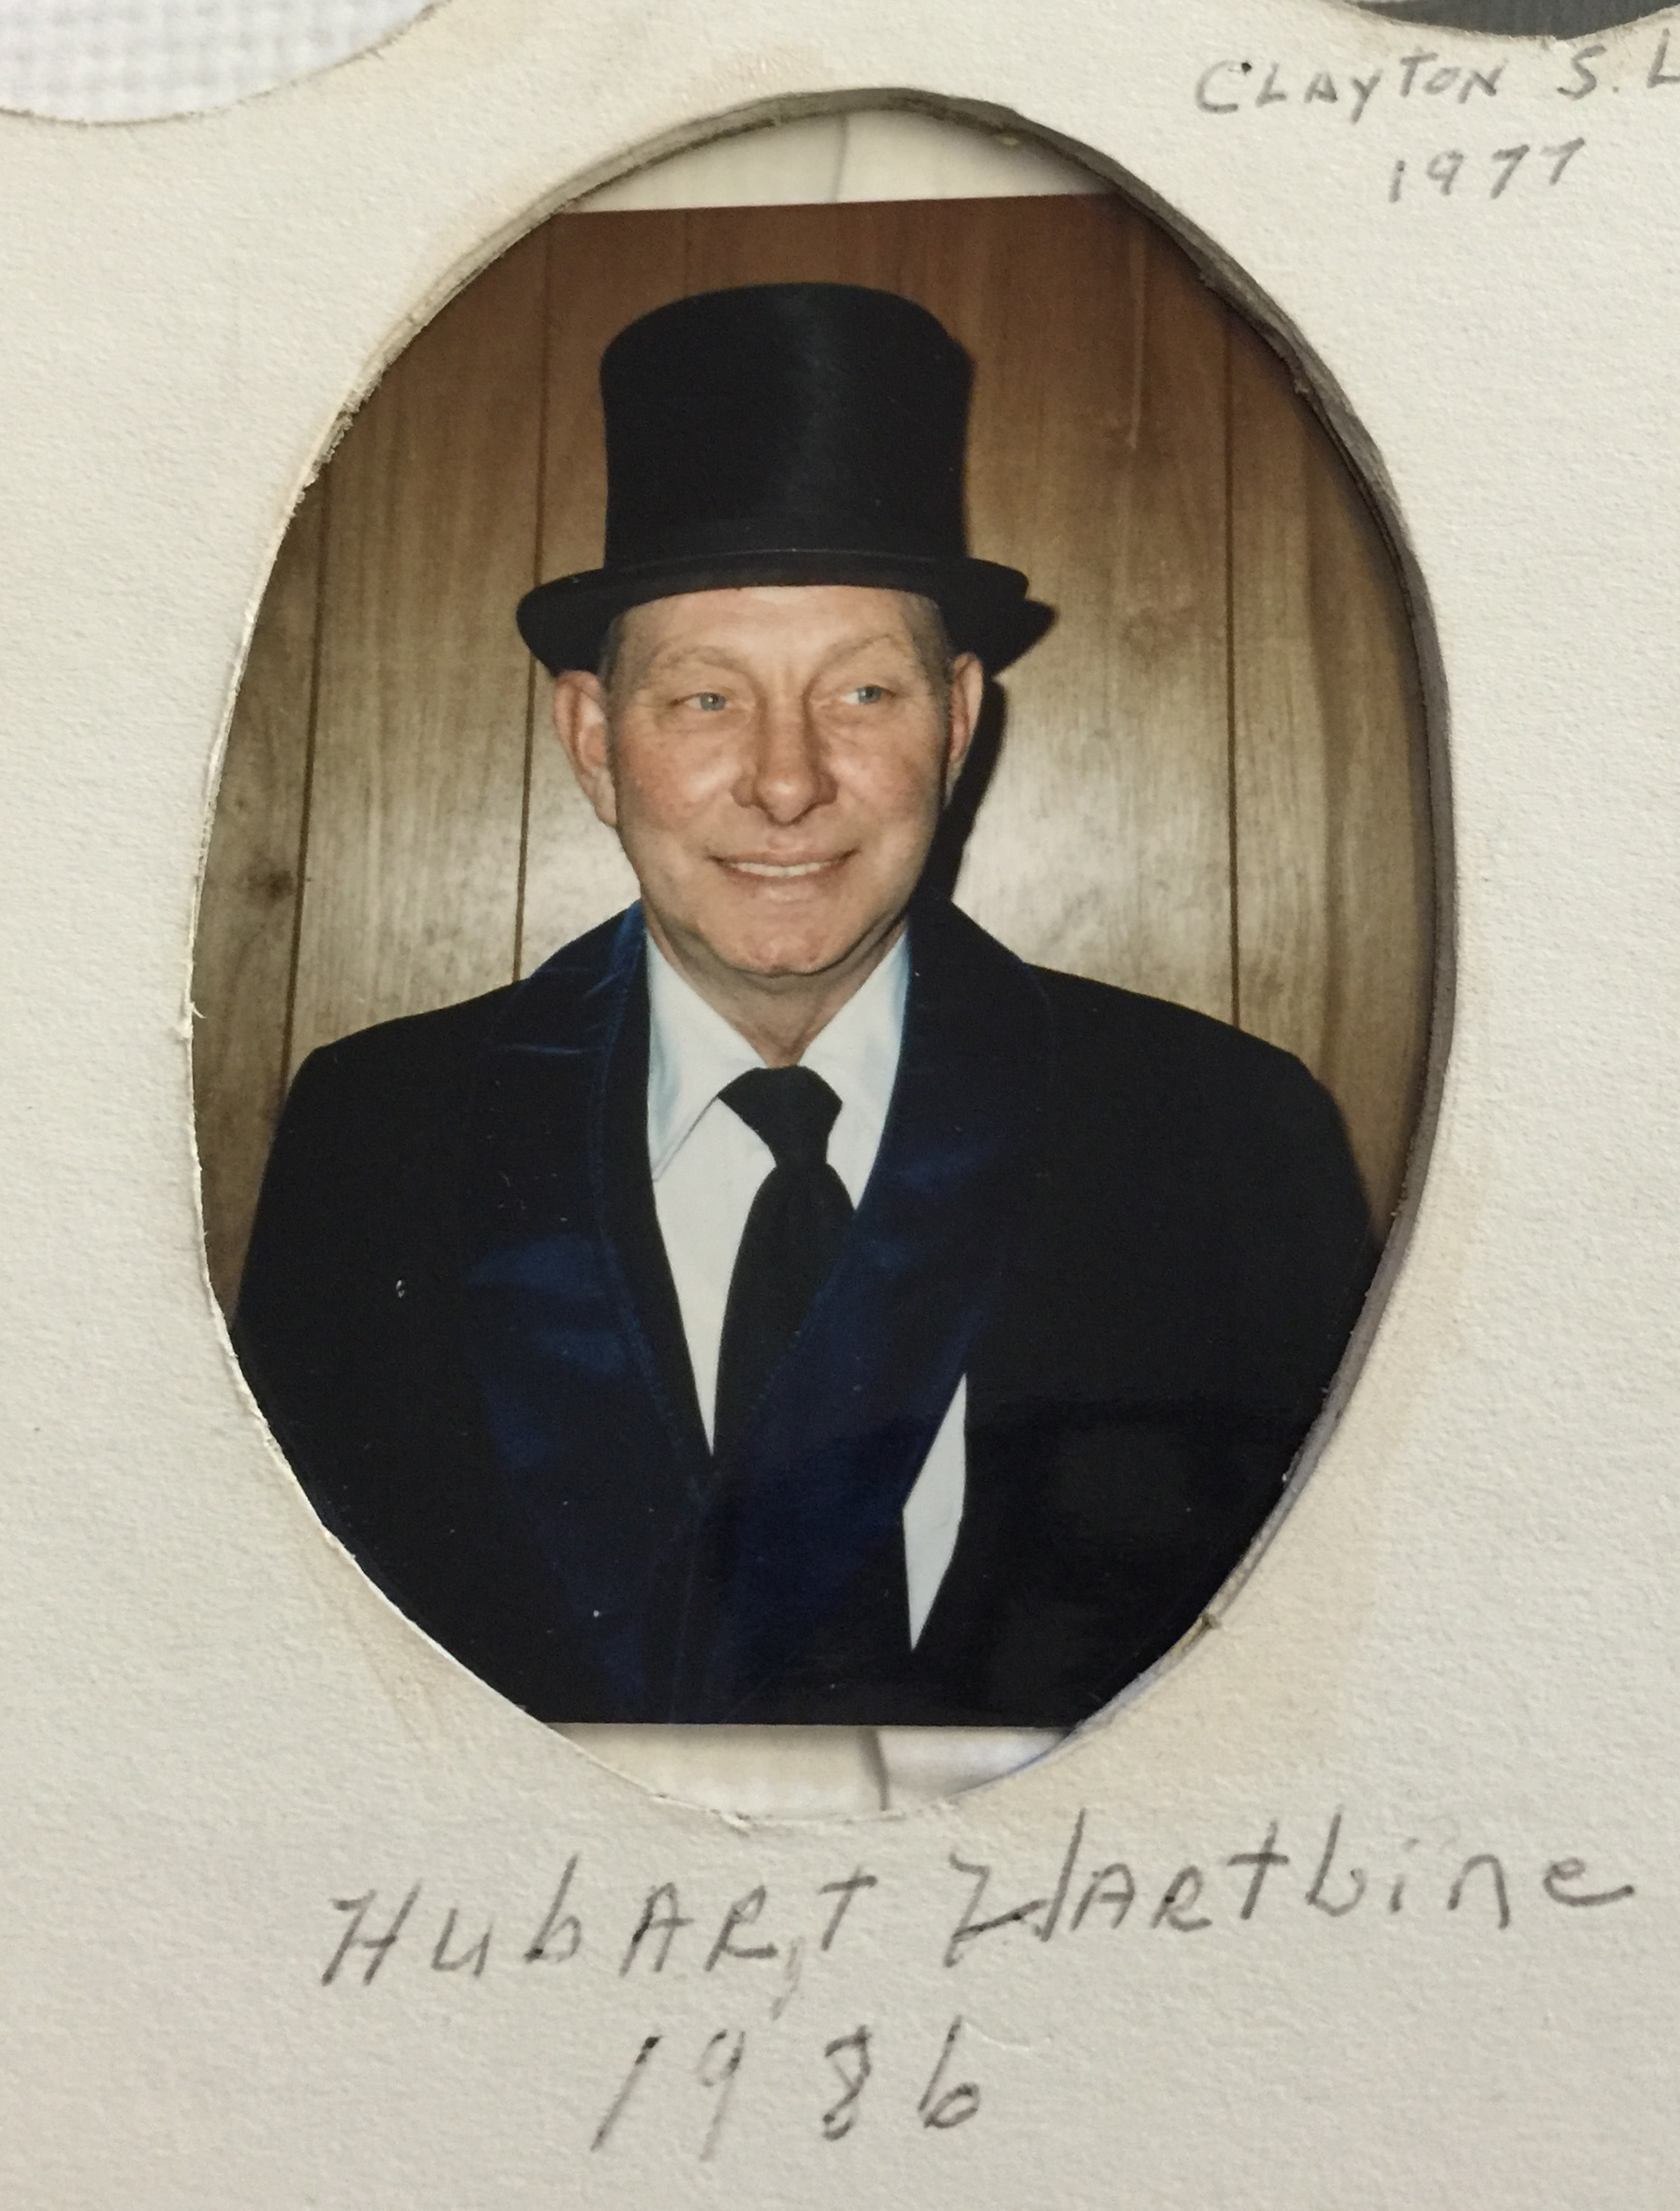 1986 Hubart Harbine